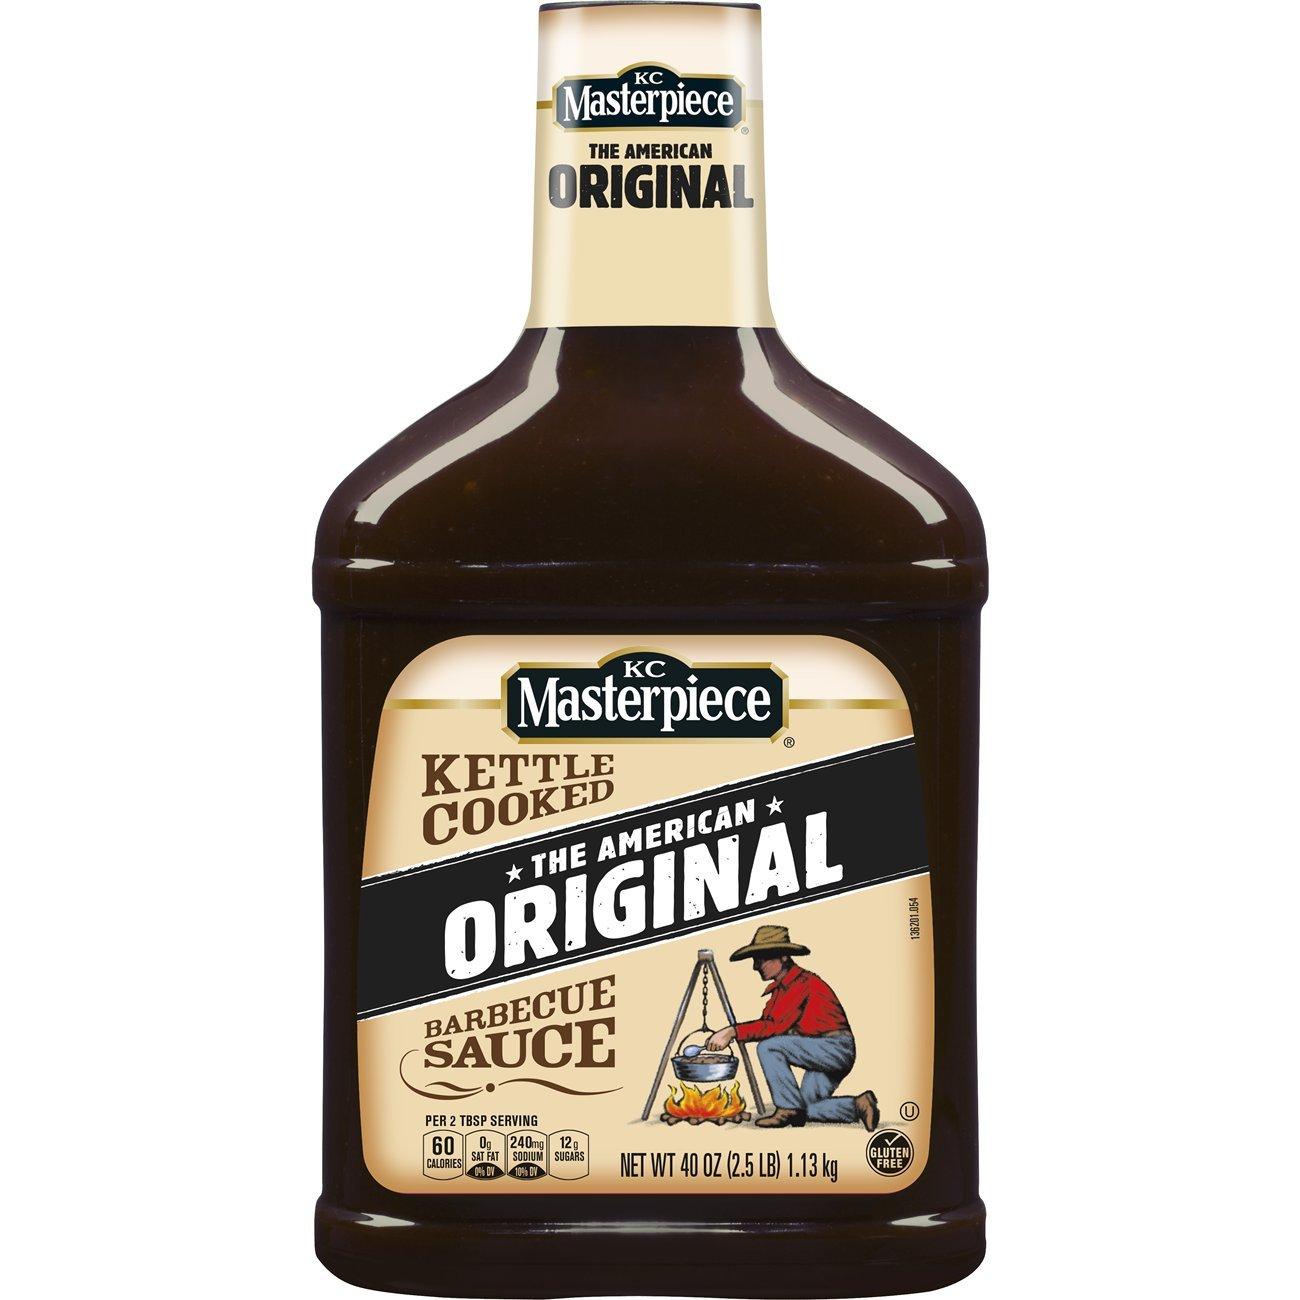 KC Masterpiece Original Barbecue Sauce, 40 Ounces, (Pack of 3)